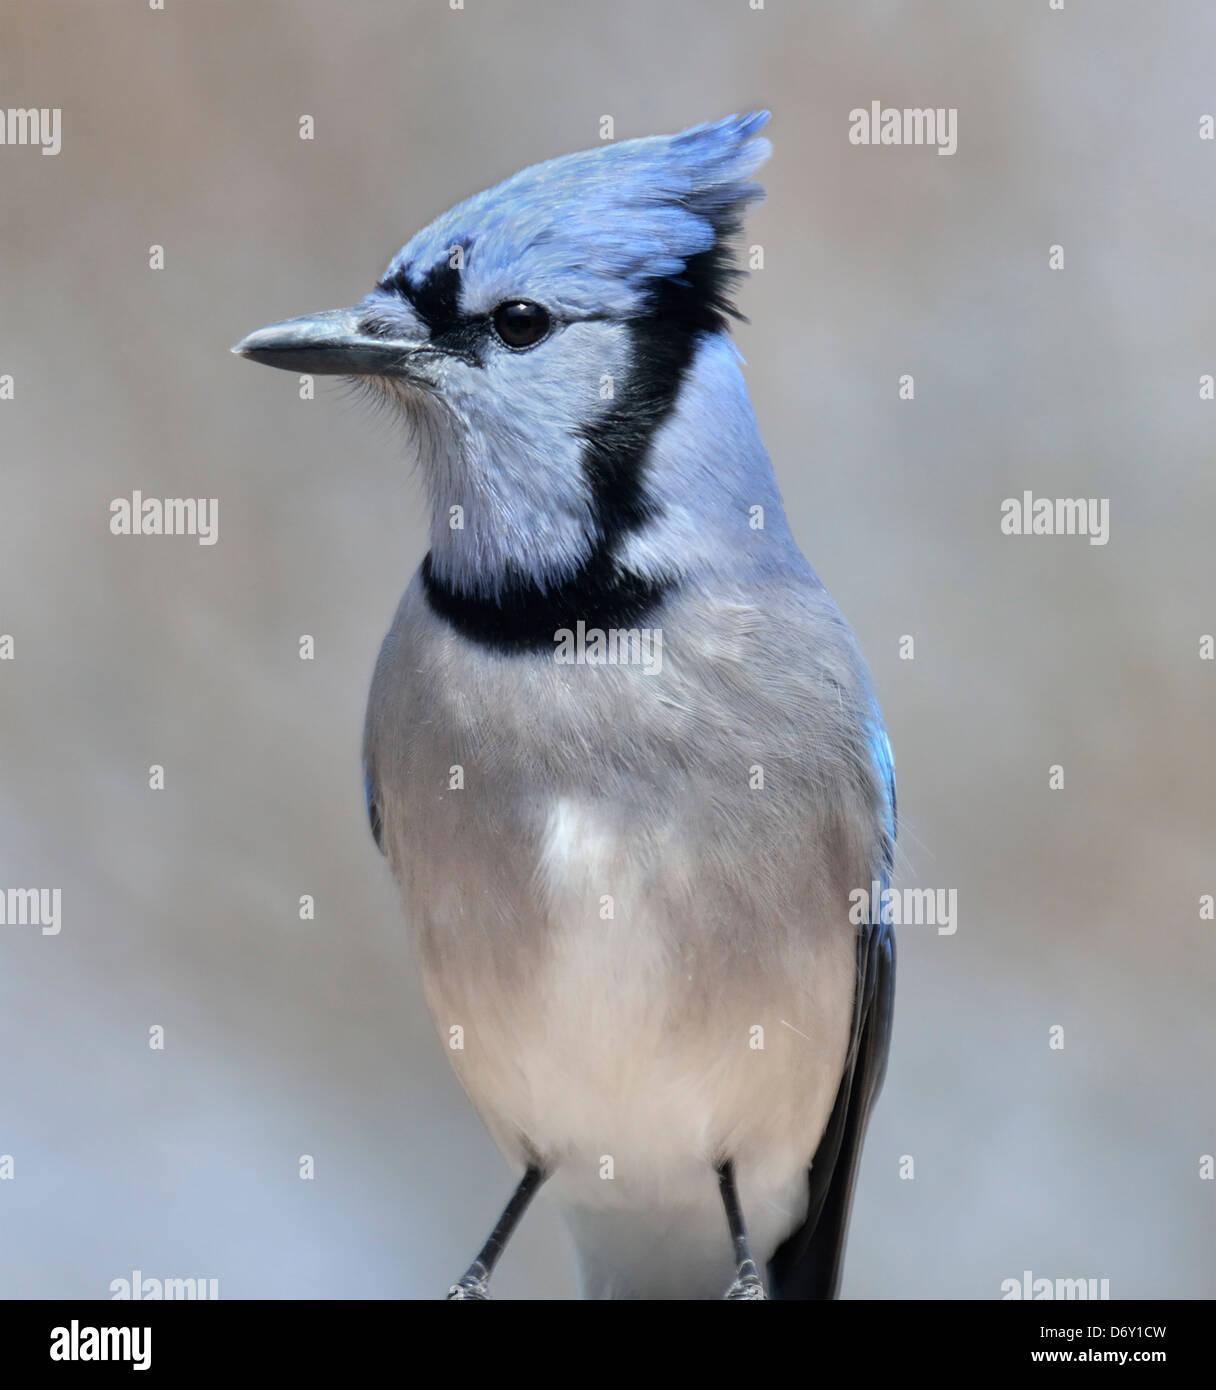 Blue Jay Bird,Close Up Stock Photo